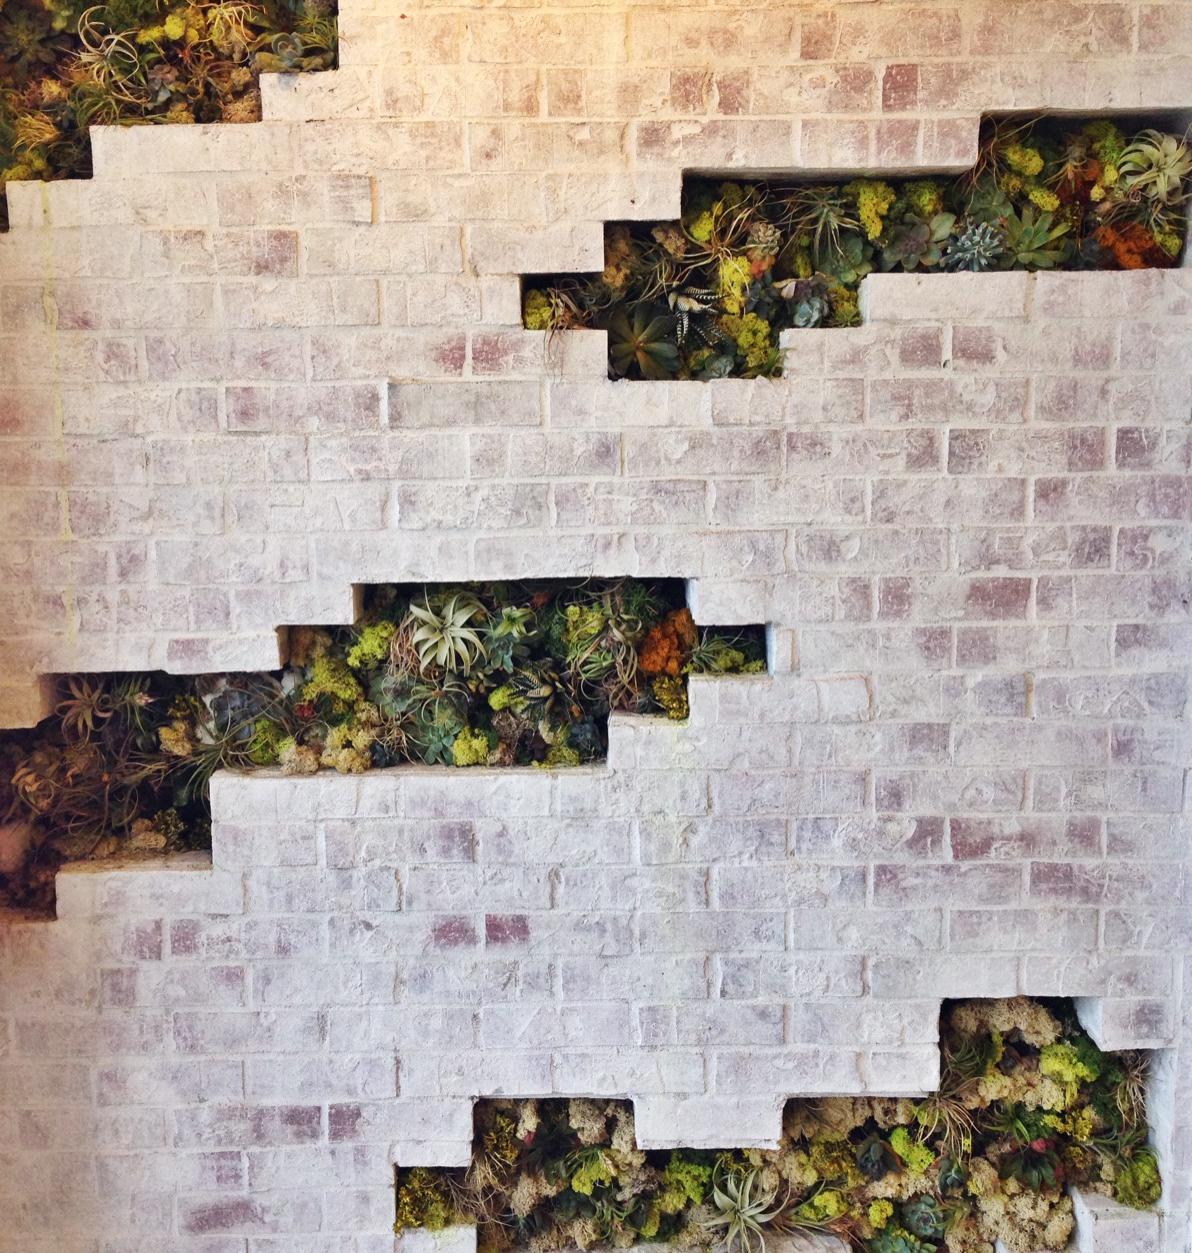 {Cool succulent-filledwall display at Splendid}